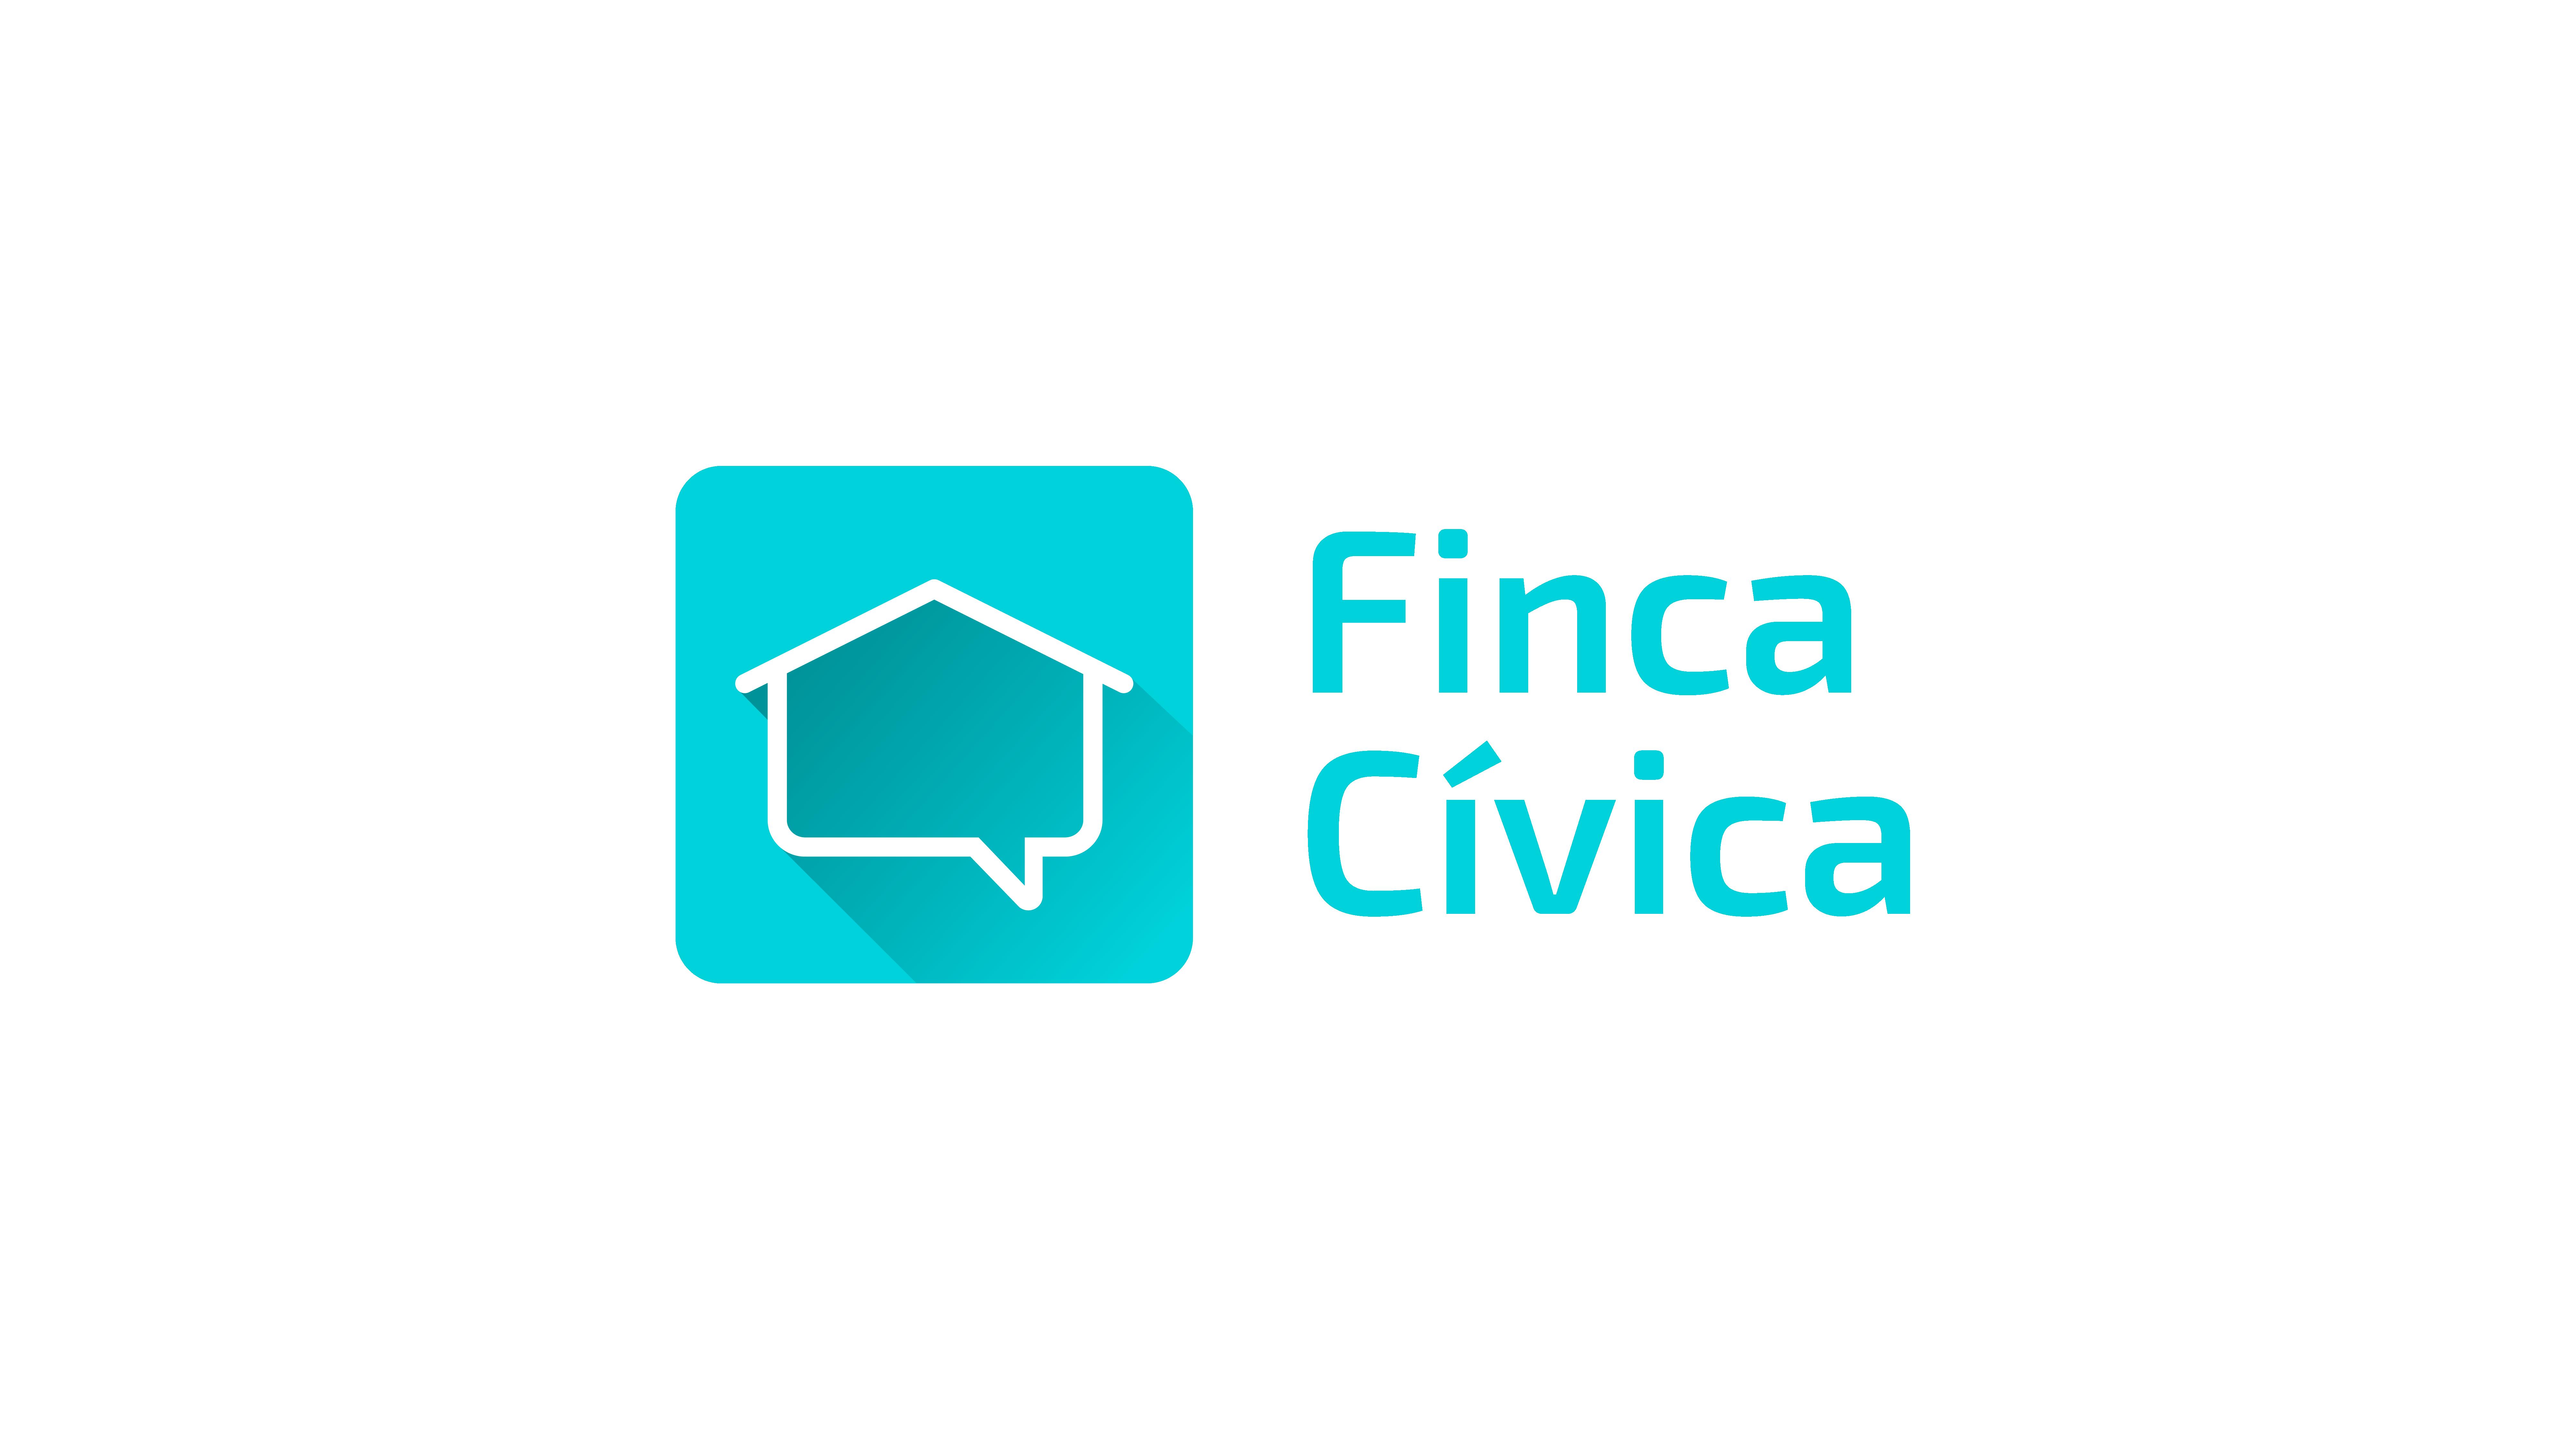 Finca Civica